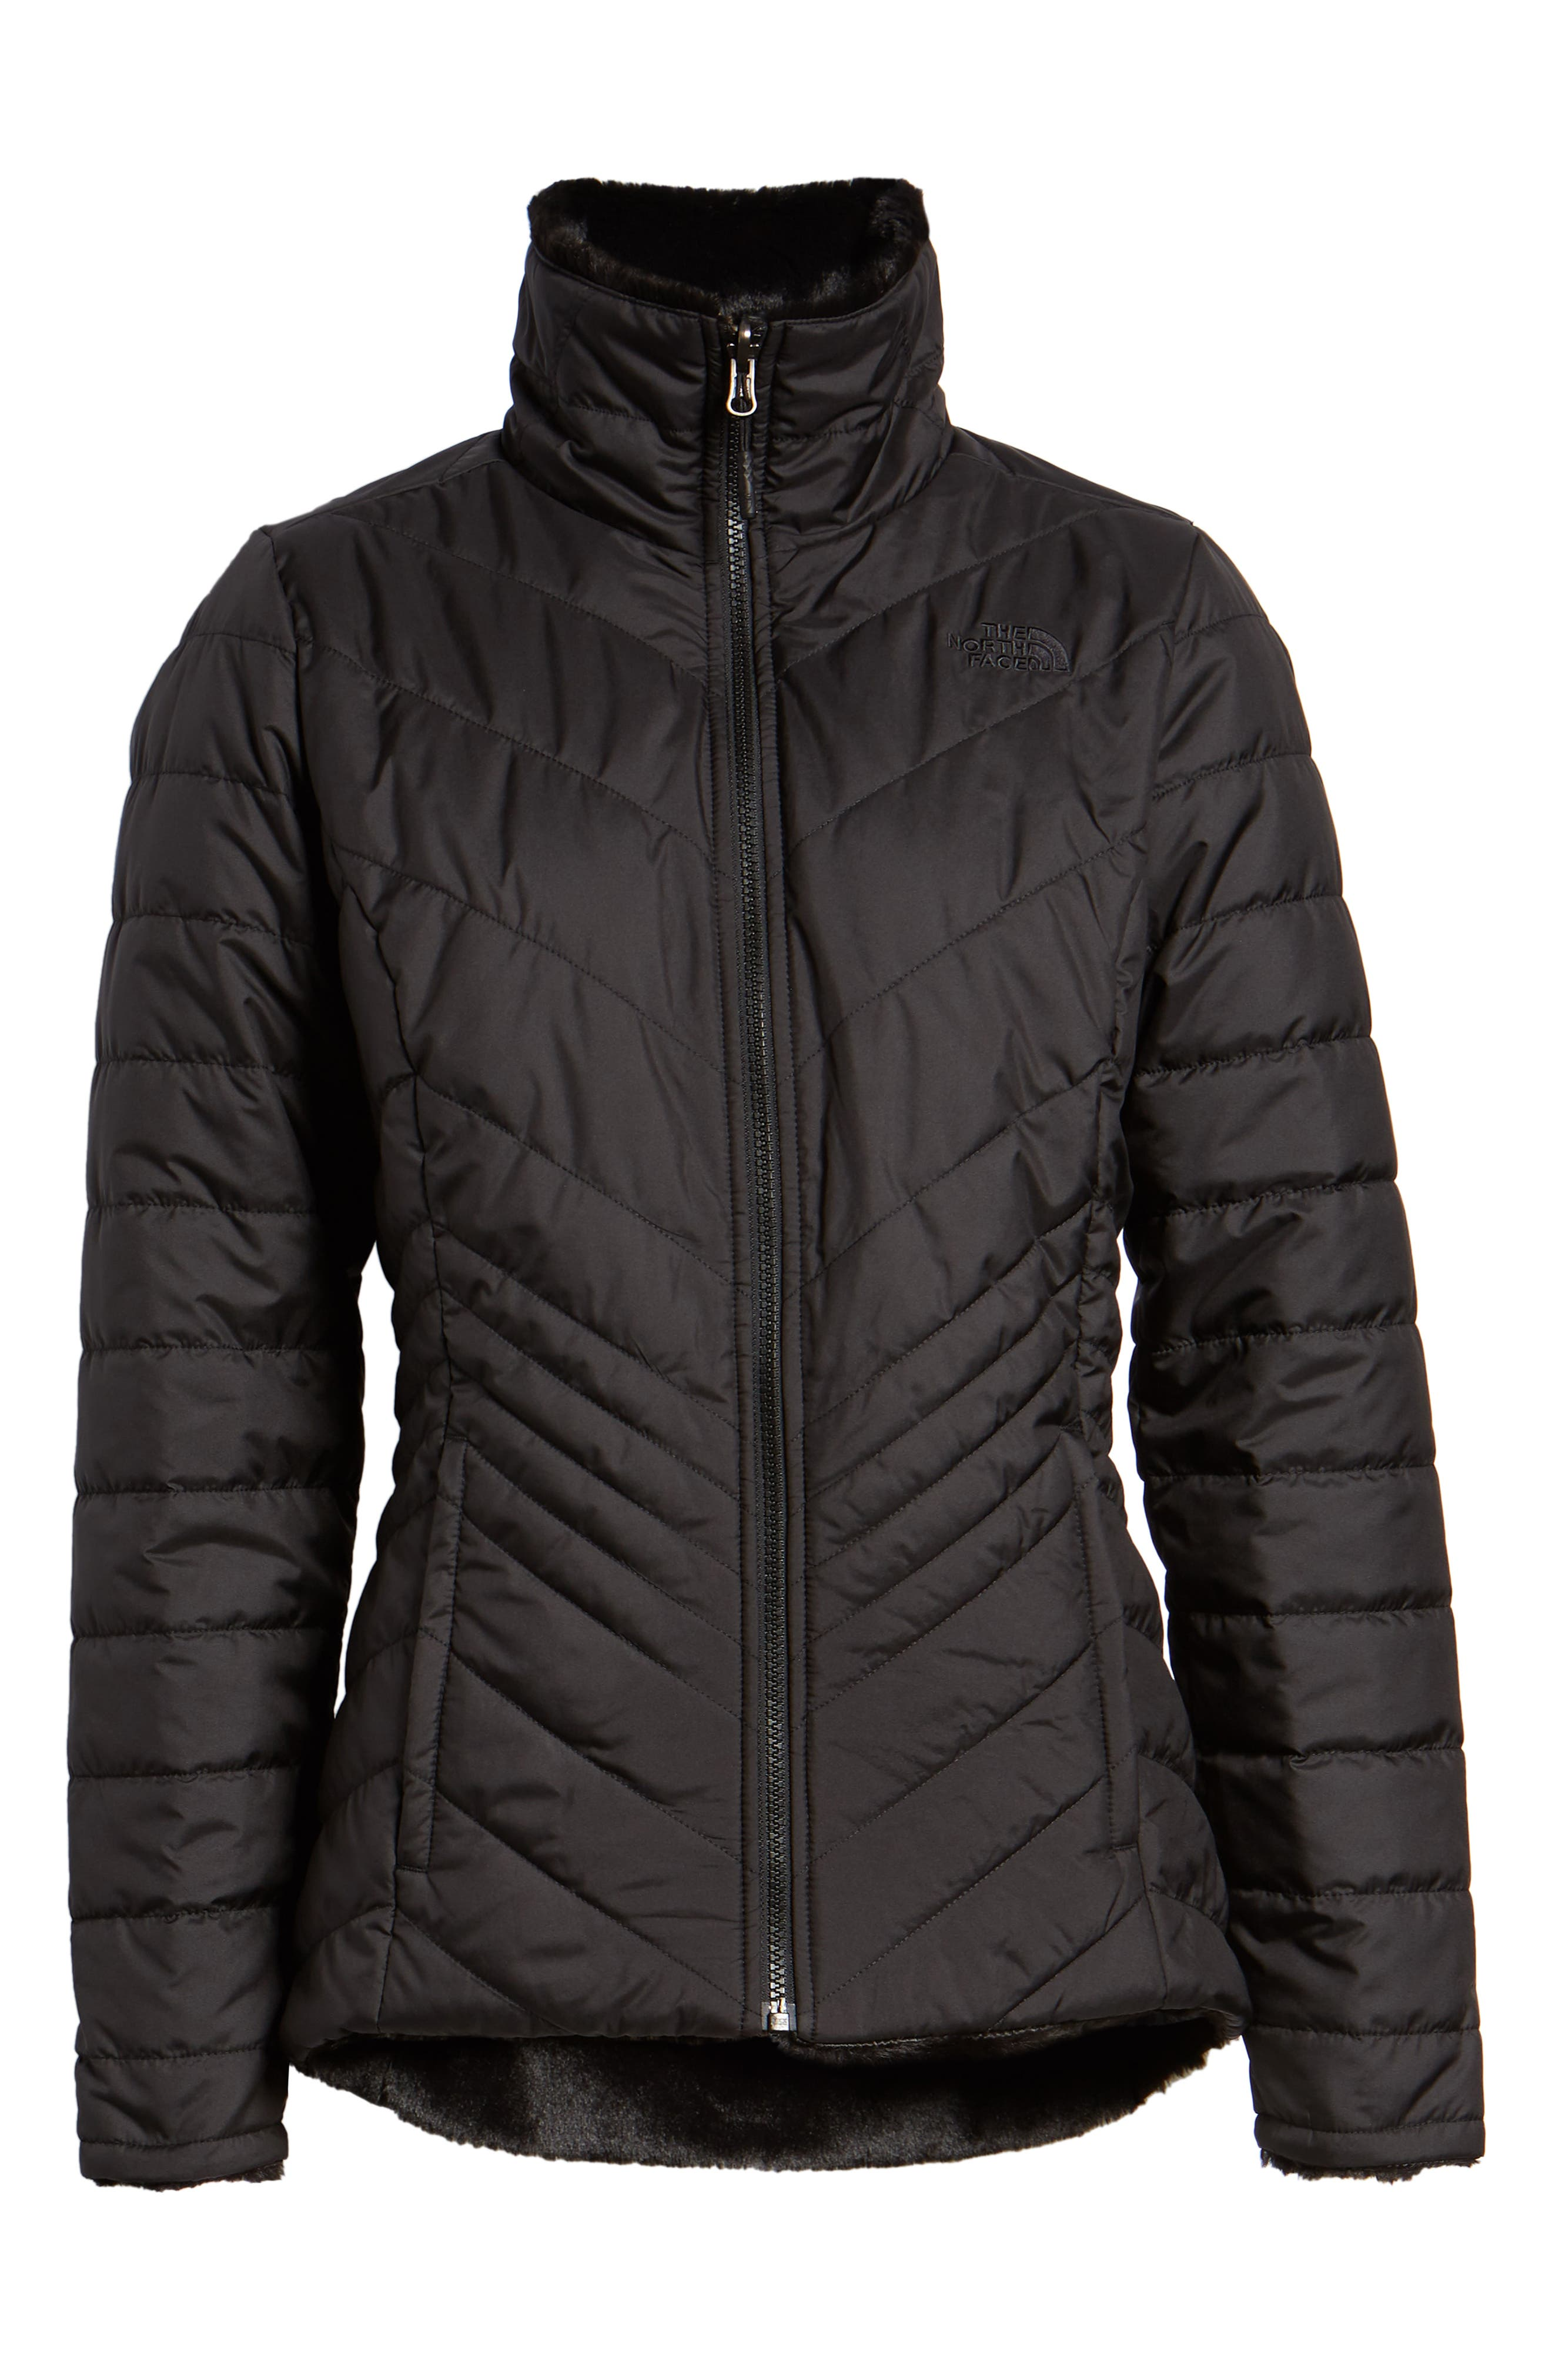 THE NORTH FACE, Mossbud Reversible Heatseeker<sup>™</sup> Wind Resistant Jacket, Alternate thumbnail 6, color, TNF BLACK